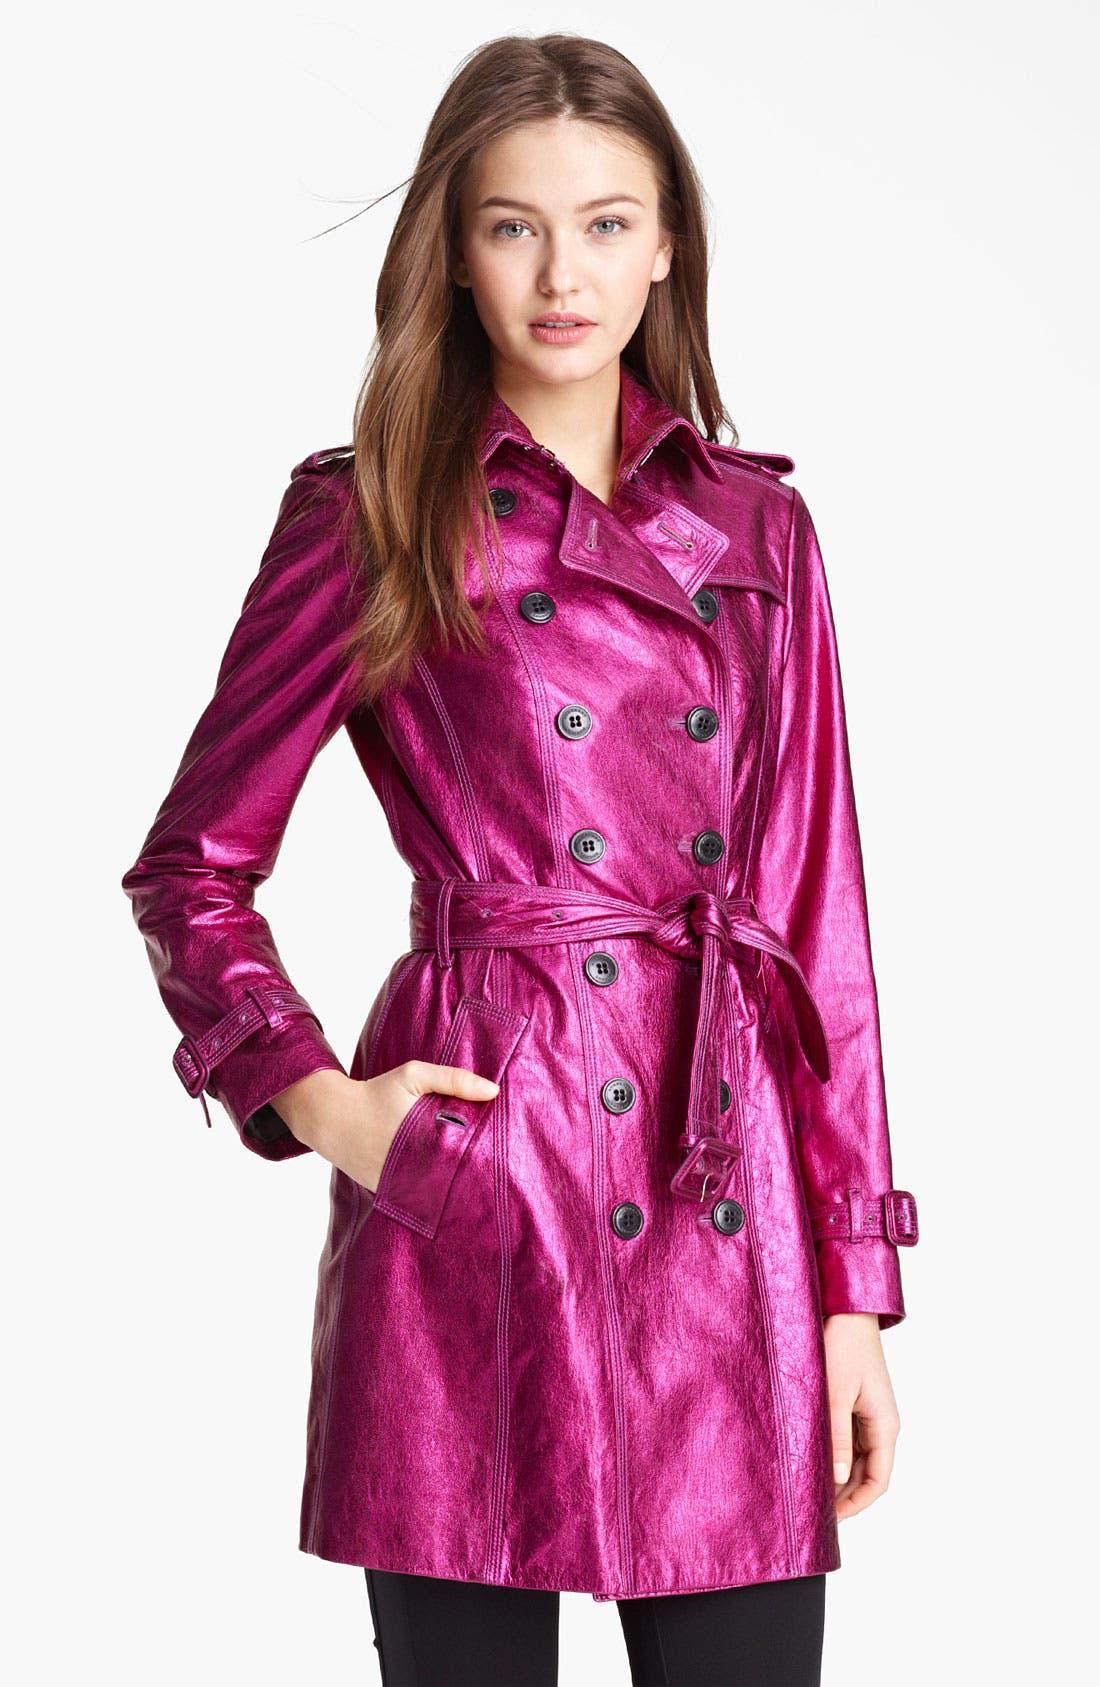 London Metallic Leather Trench Coat,                         Main,                         color, Fuchsia